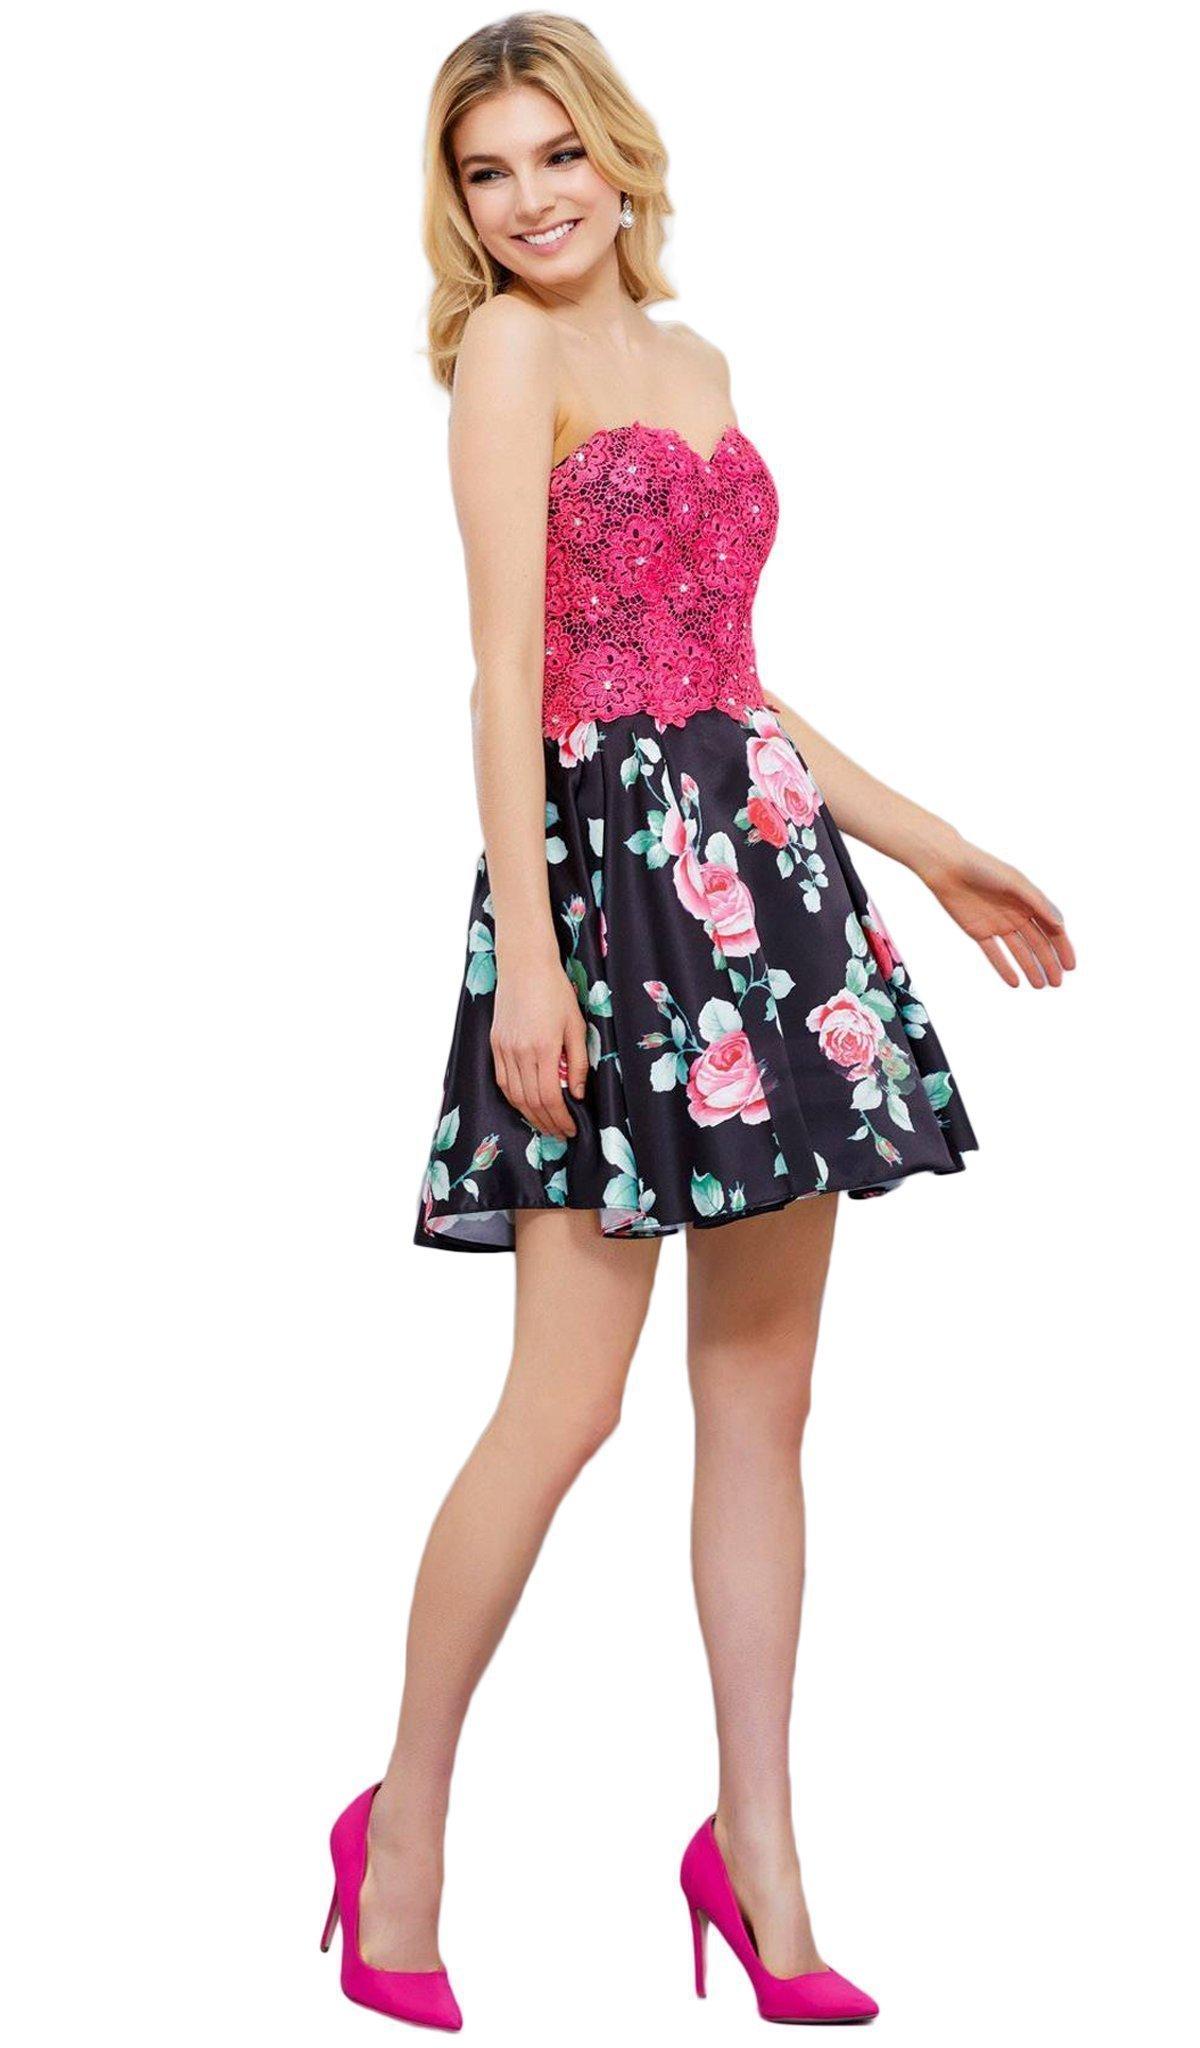 Nox Anabel - 6270 Two-Piece Lace Corset Floral Cocktail Dress